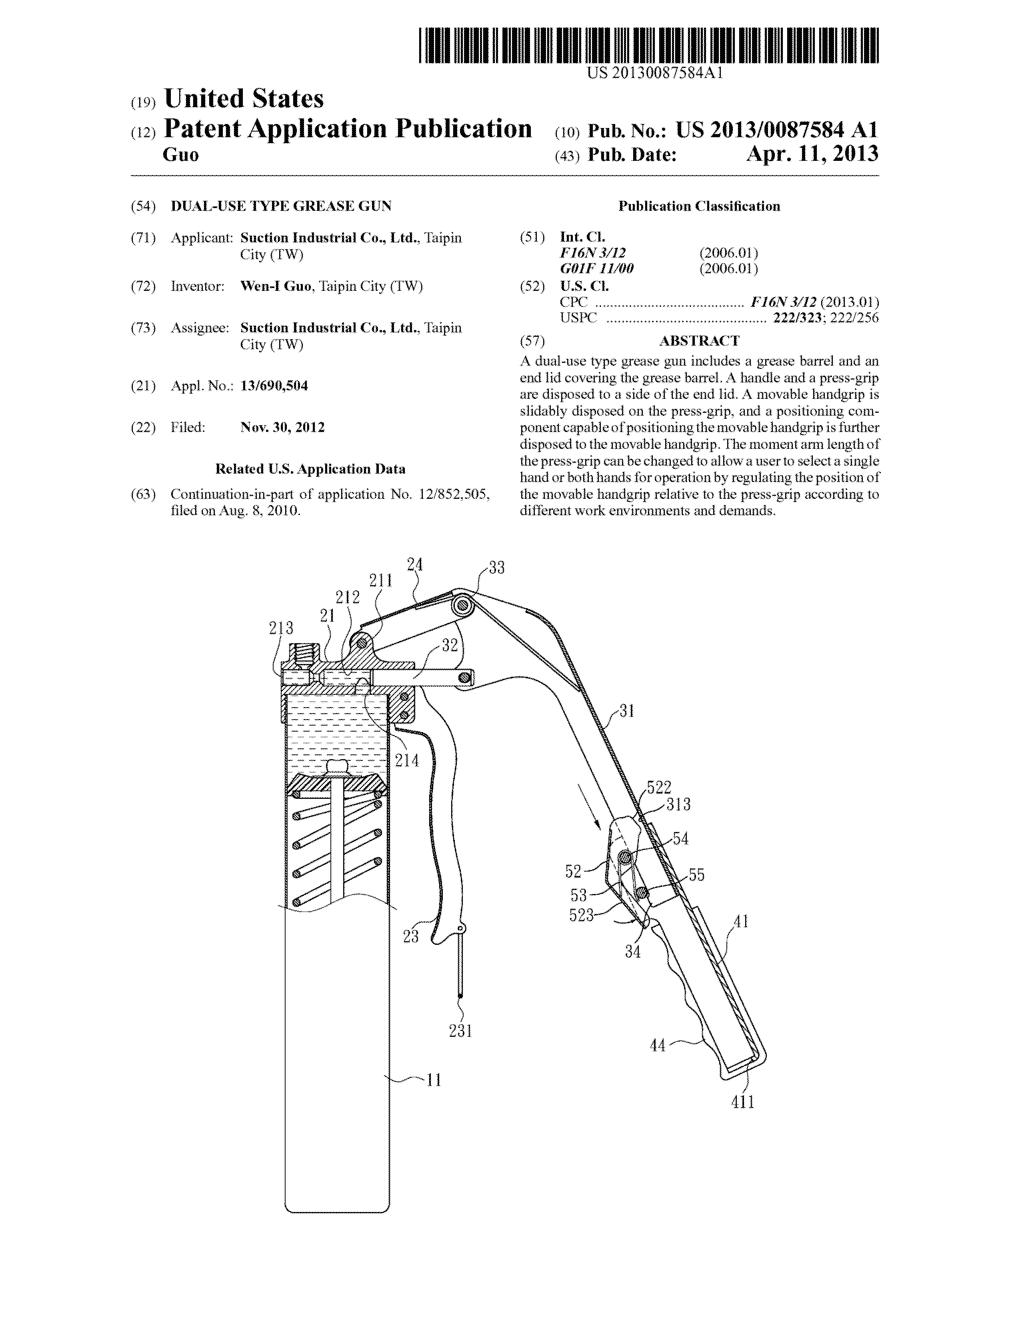 dual use type grease gun diagram, schematic, and image 01Diagram Of Grease Gun #3